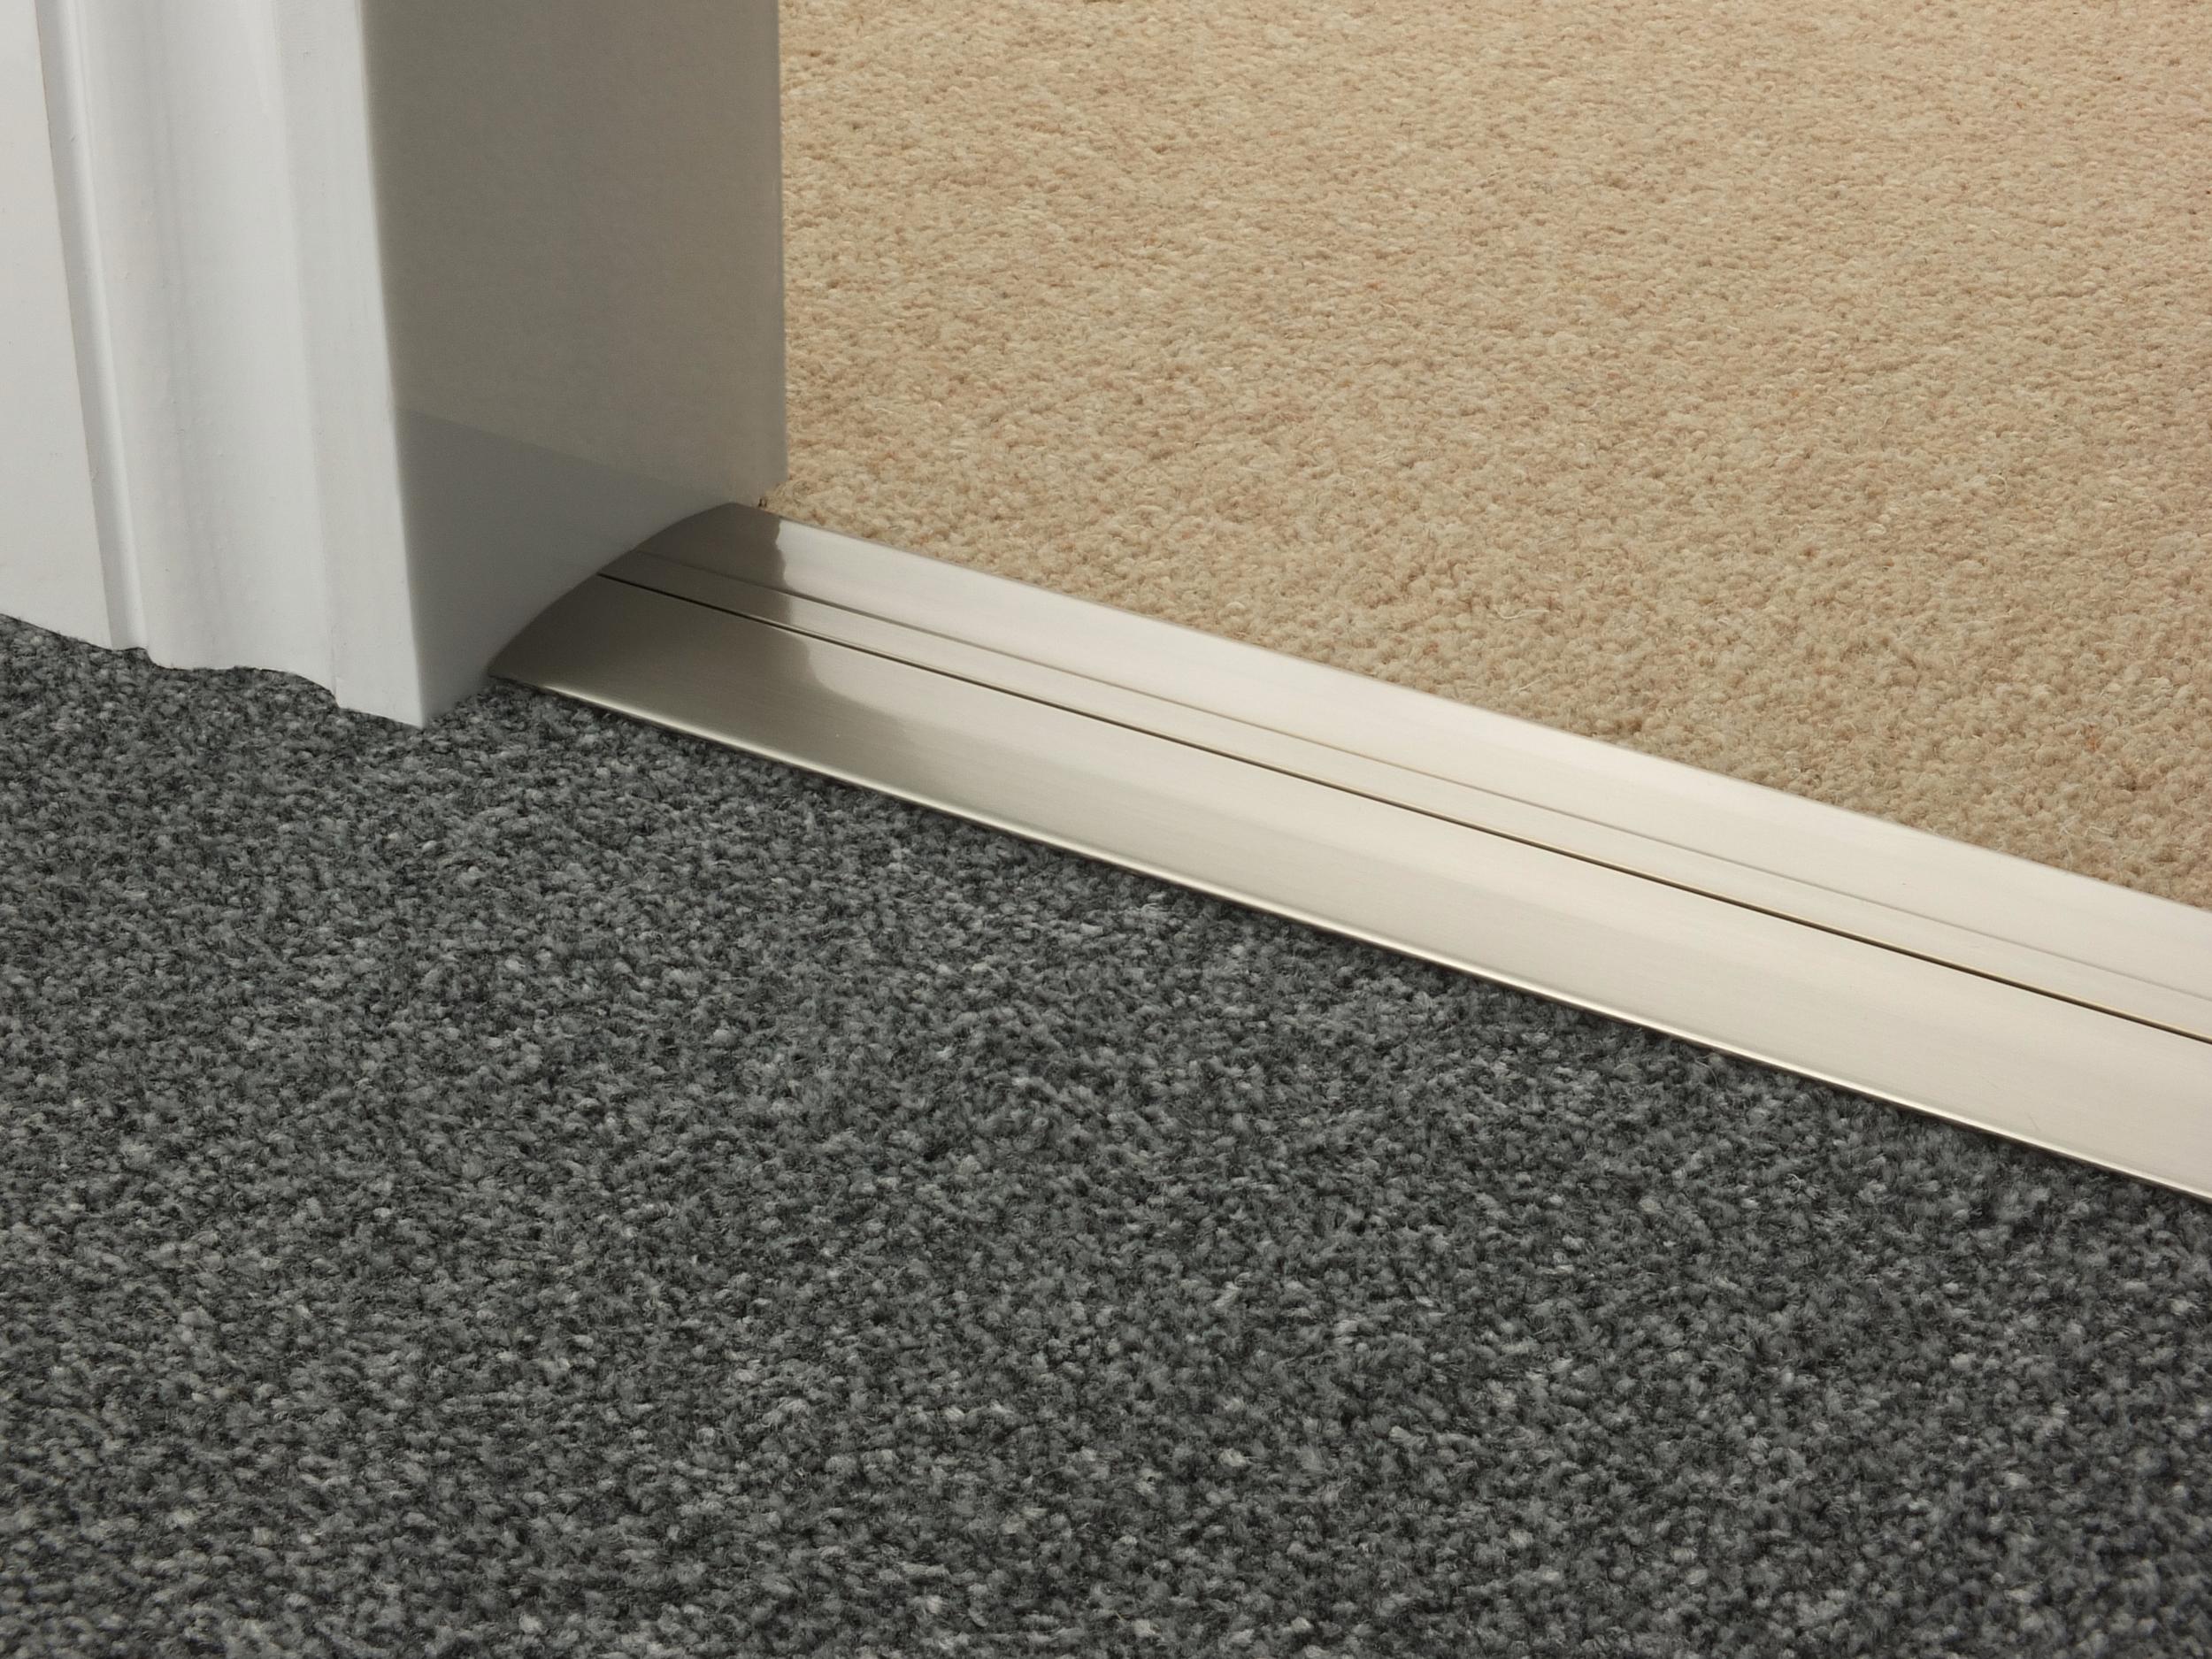 door_bar_satin_nickel_posh55_carpet_carpet.jpg